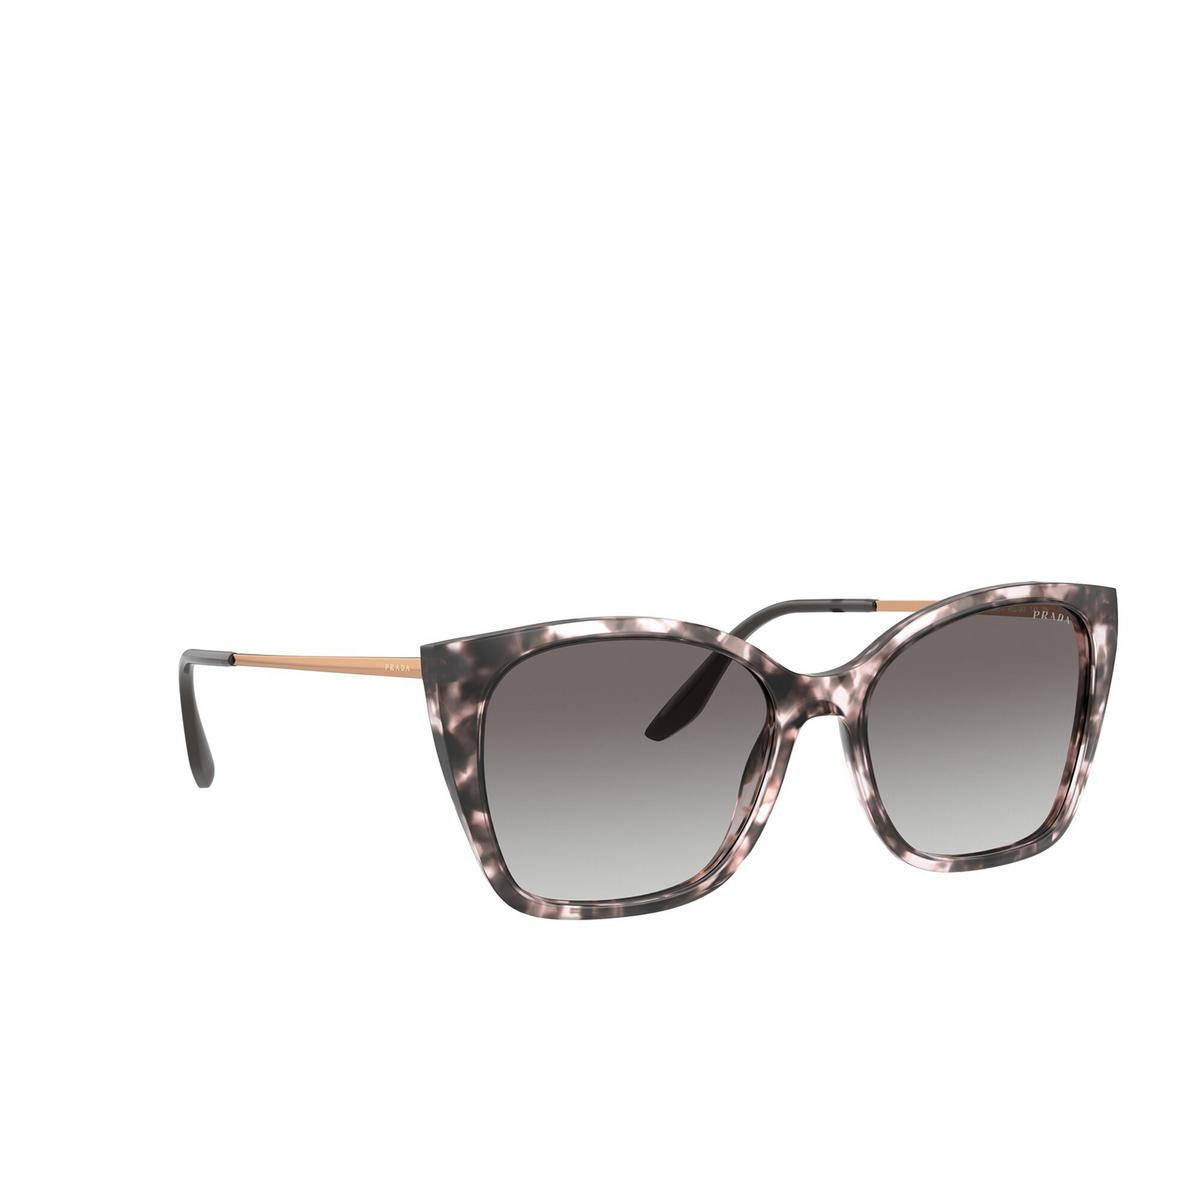 Prada® Cat-eye Sunglasses: PR 12XS color Orchid Tortoise ROJ0A7 - three-quarters view.